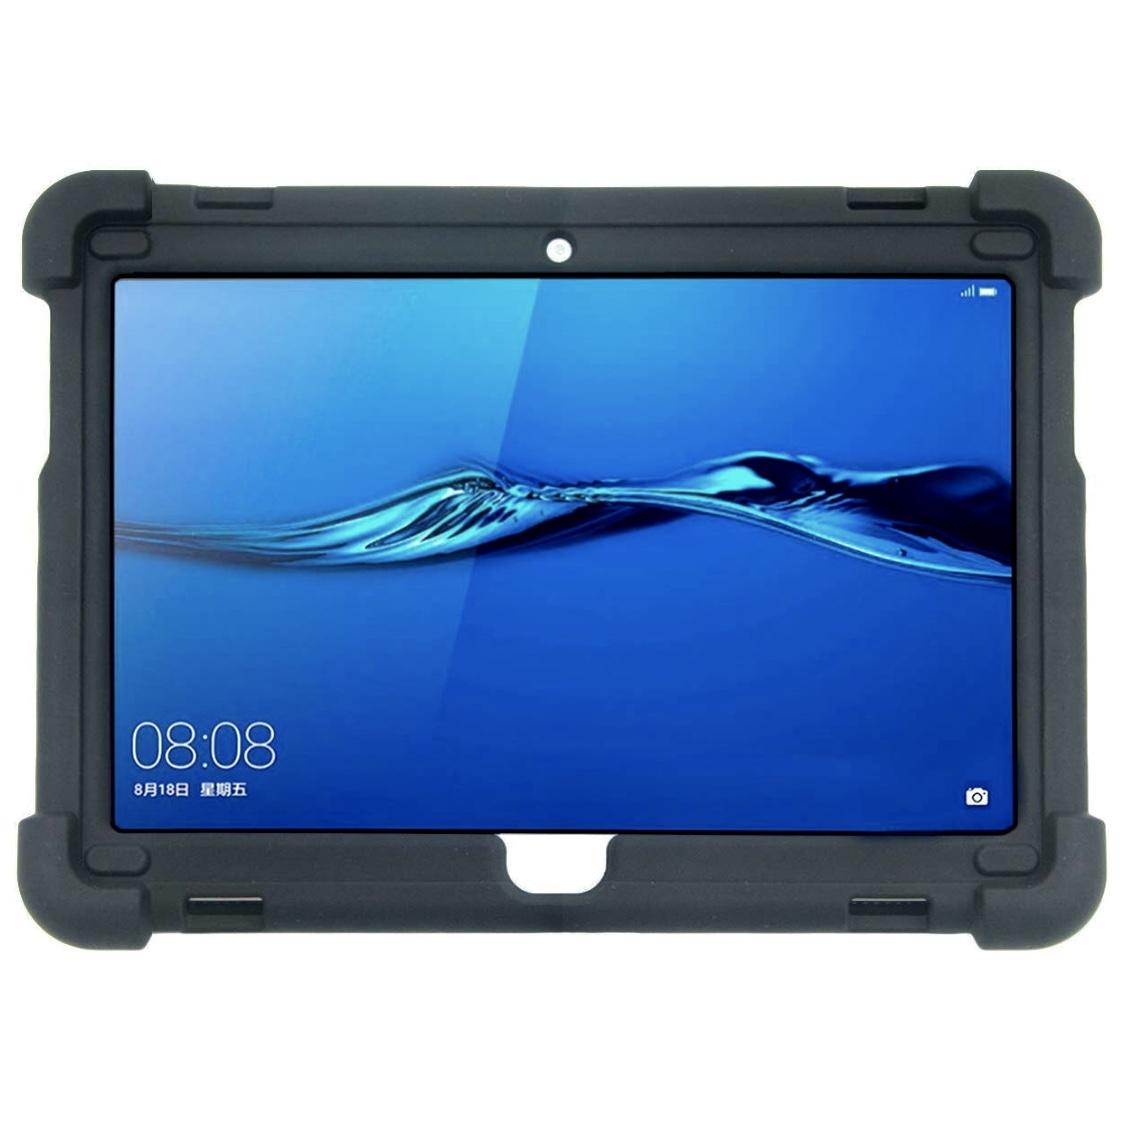 MediaPad M3 LITE 10.1 de HUAWEI Coque Silicone renforce Premium Noir